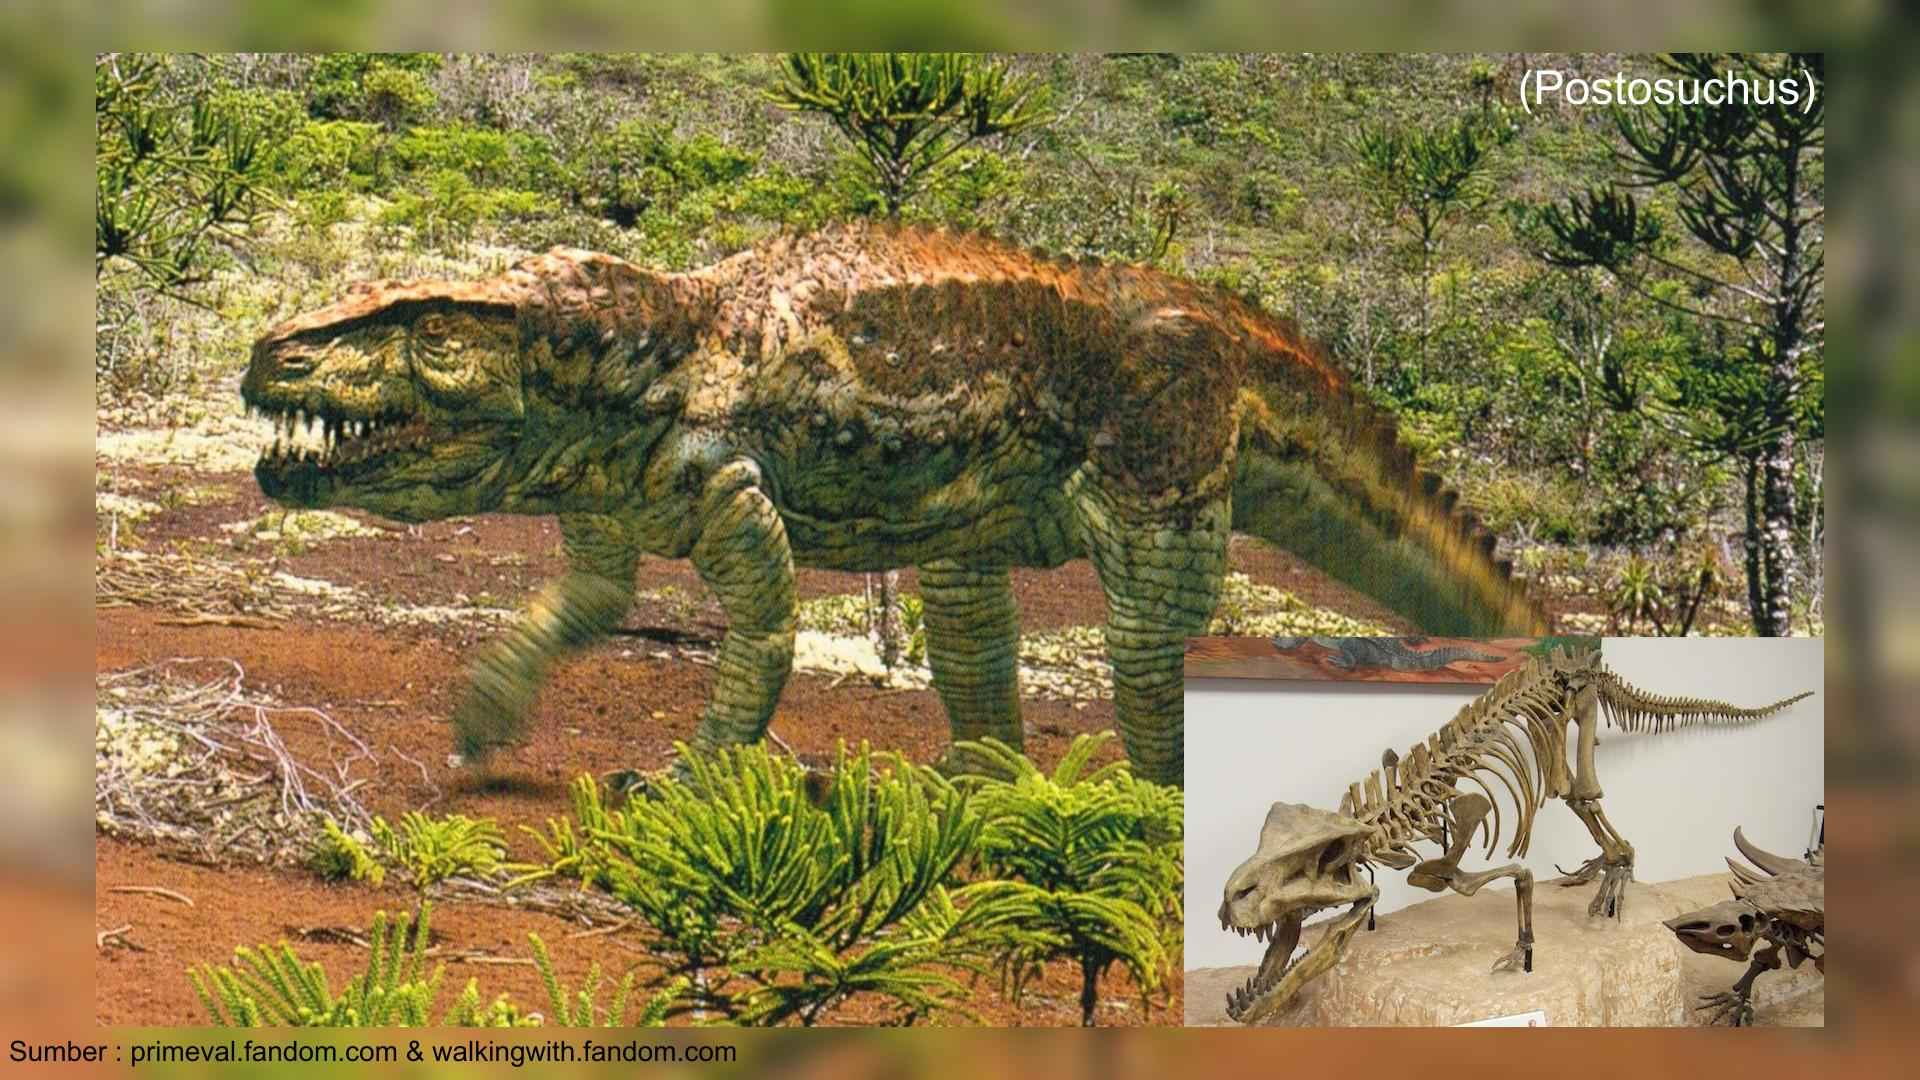 postosuchus walking with dinosaurs